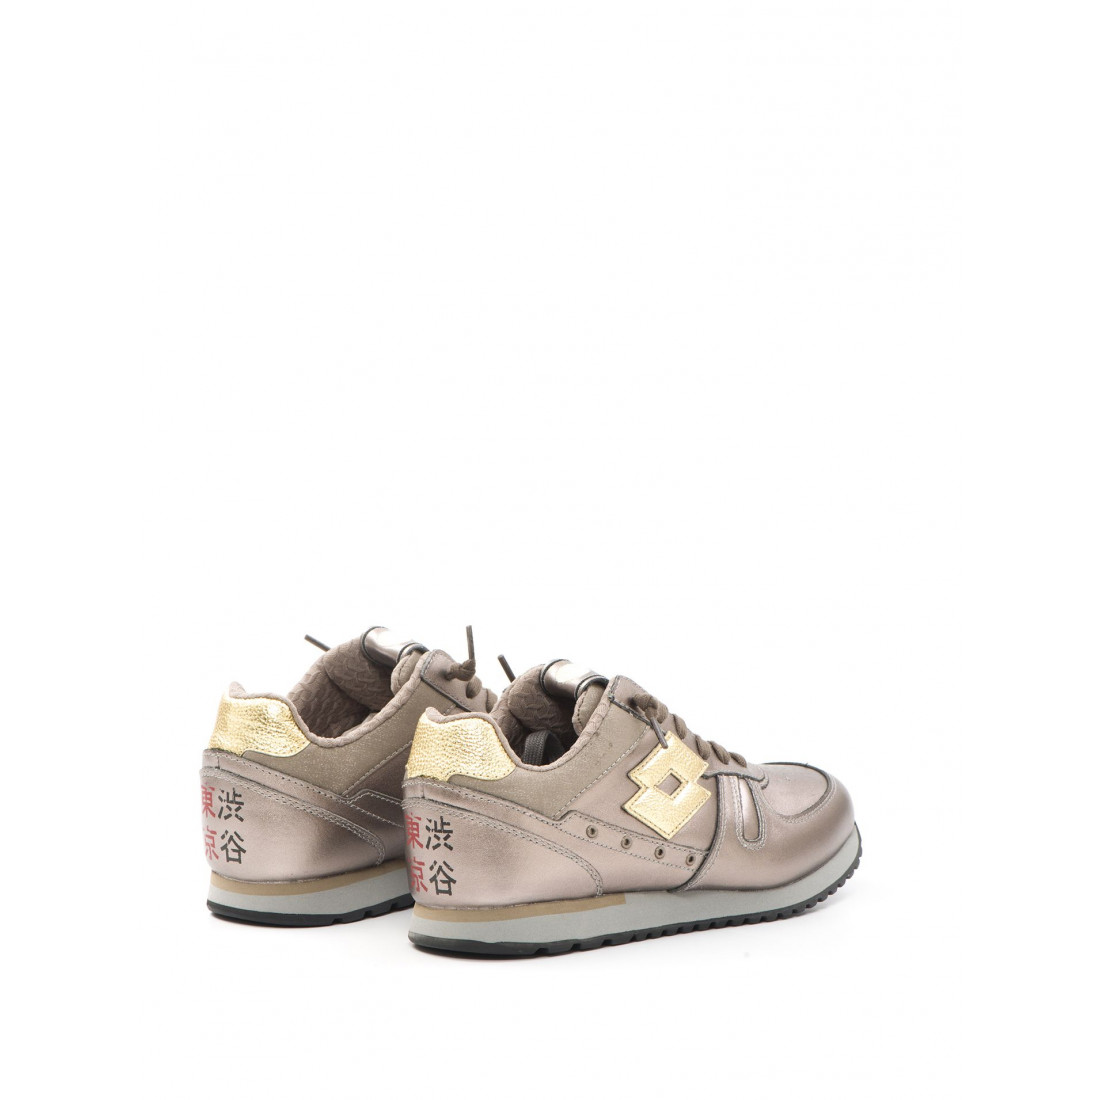 sneakers woman lotto leggenda tokyo shibuya ws5858 mt sesgld str 1425